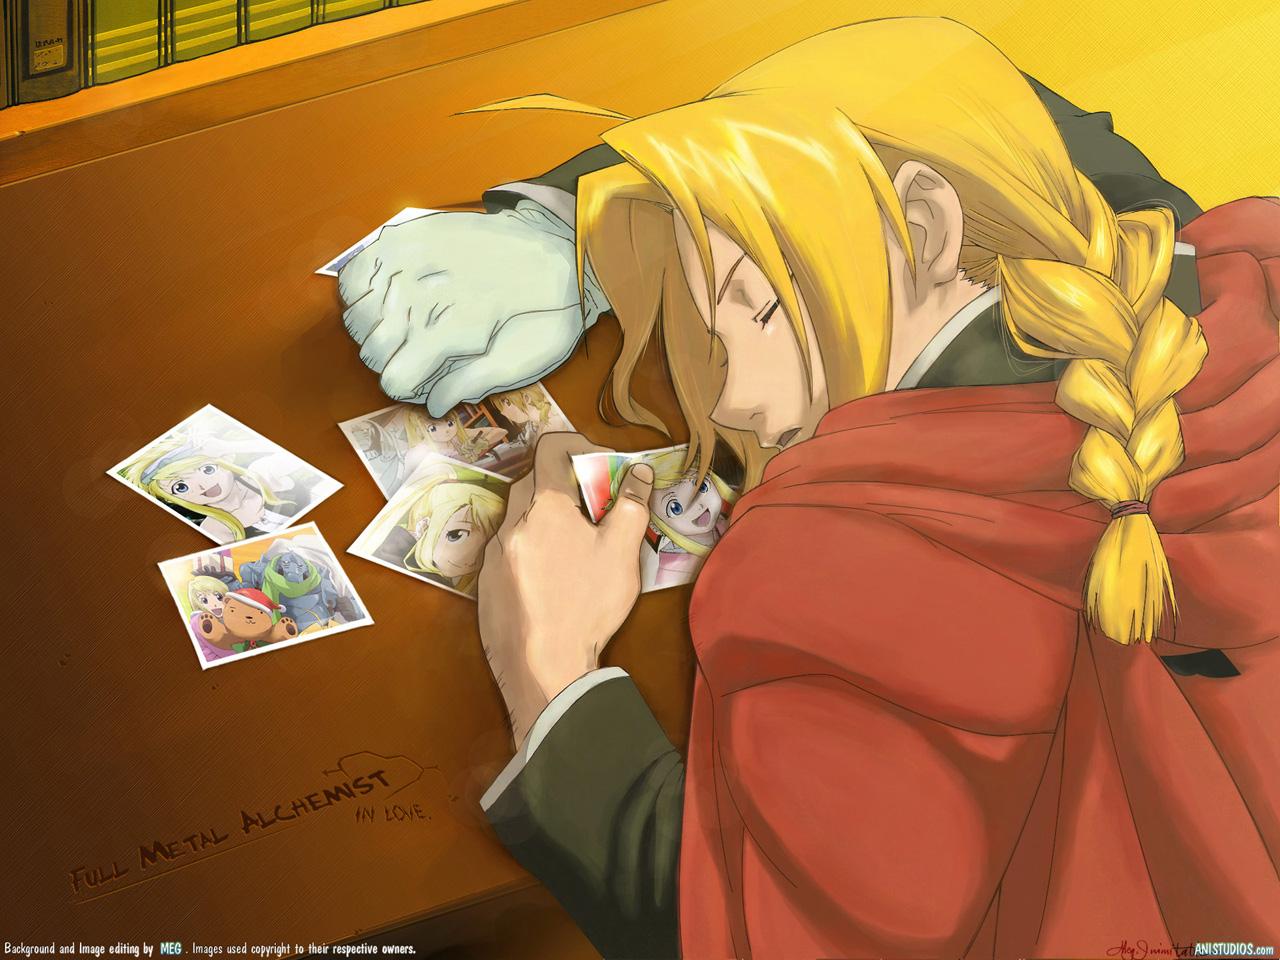 Fullmetal Alchemist Edward Elric and Winry